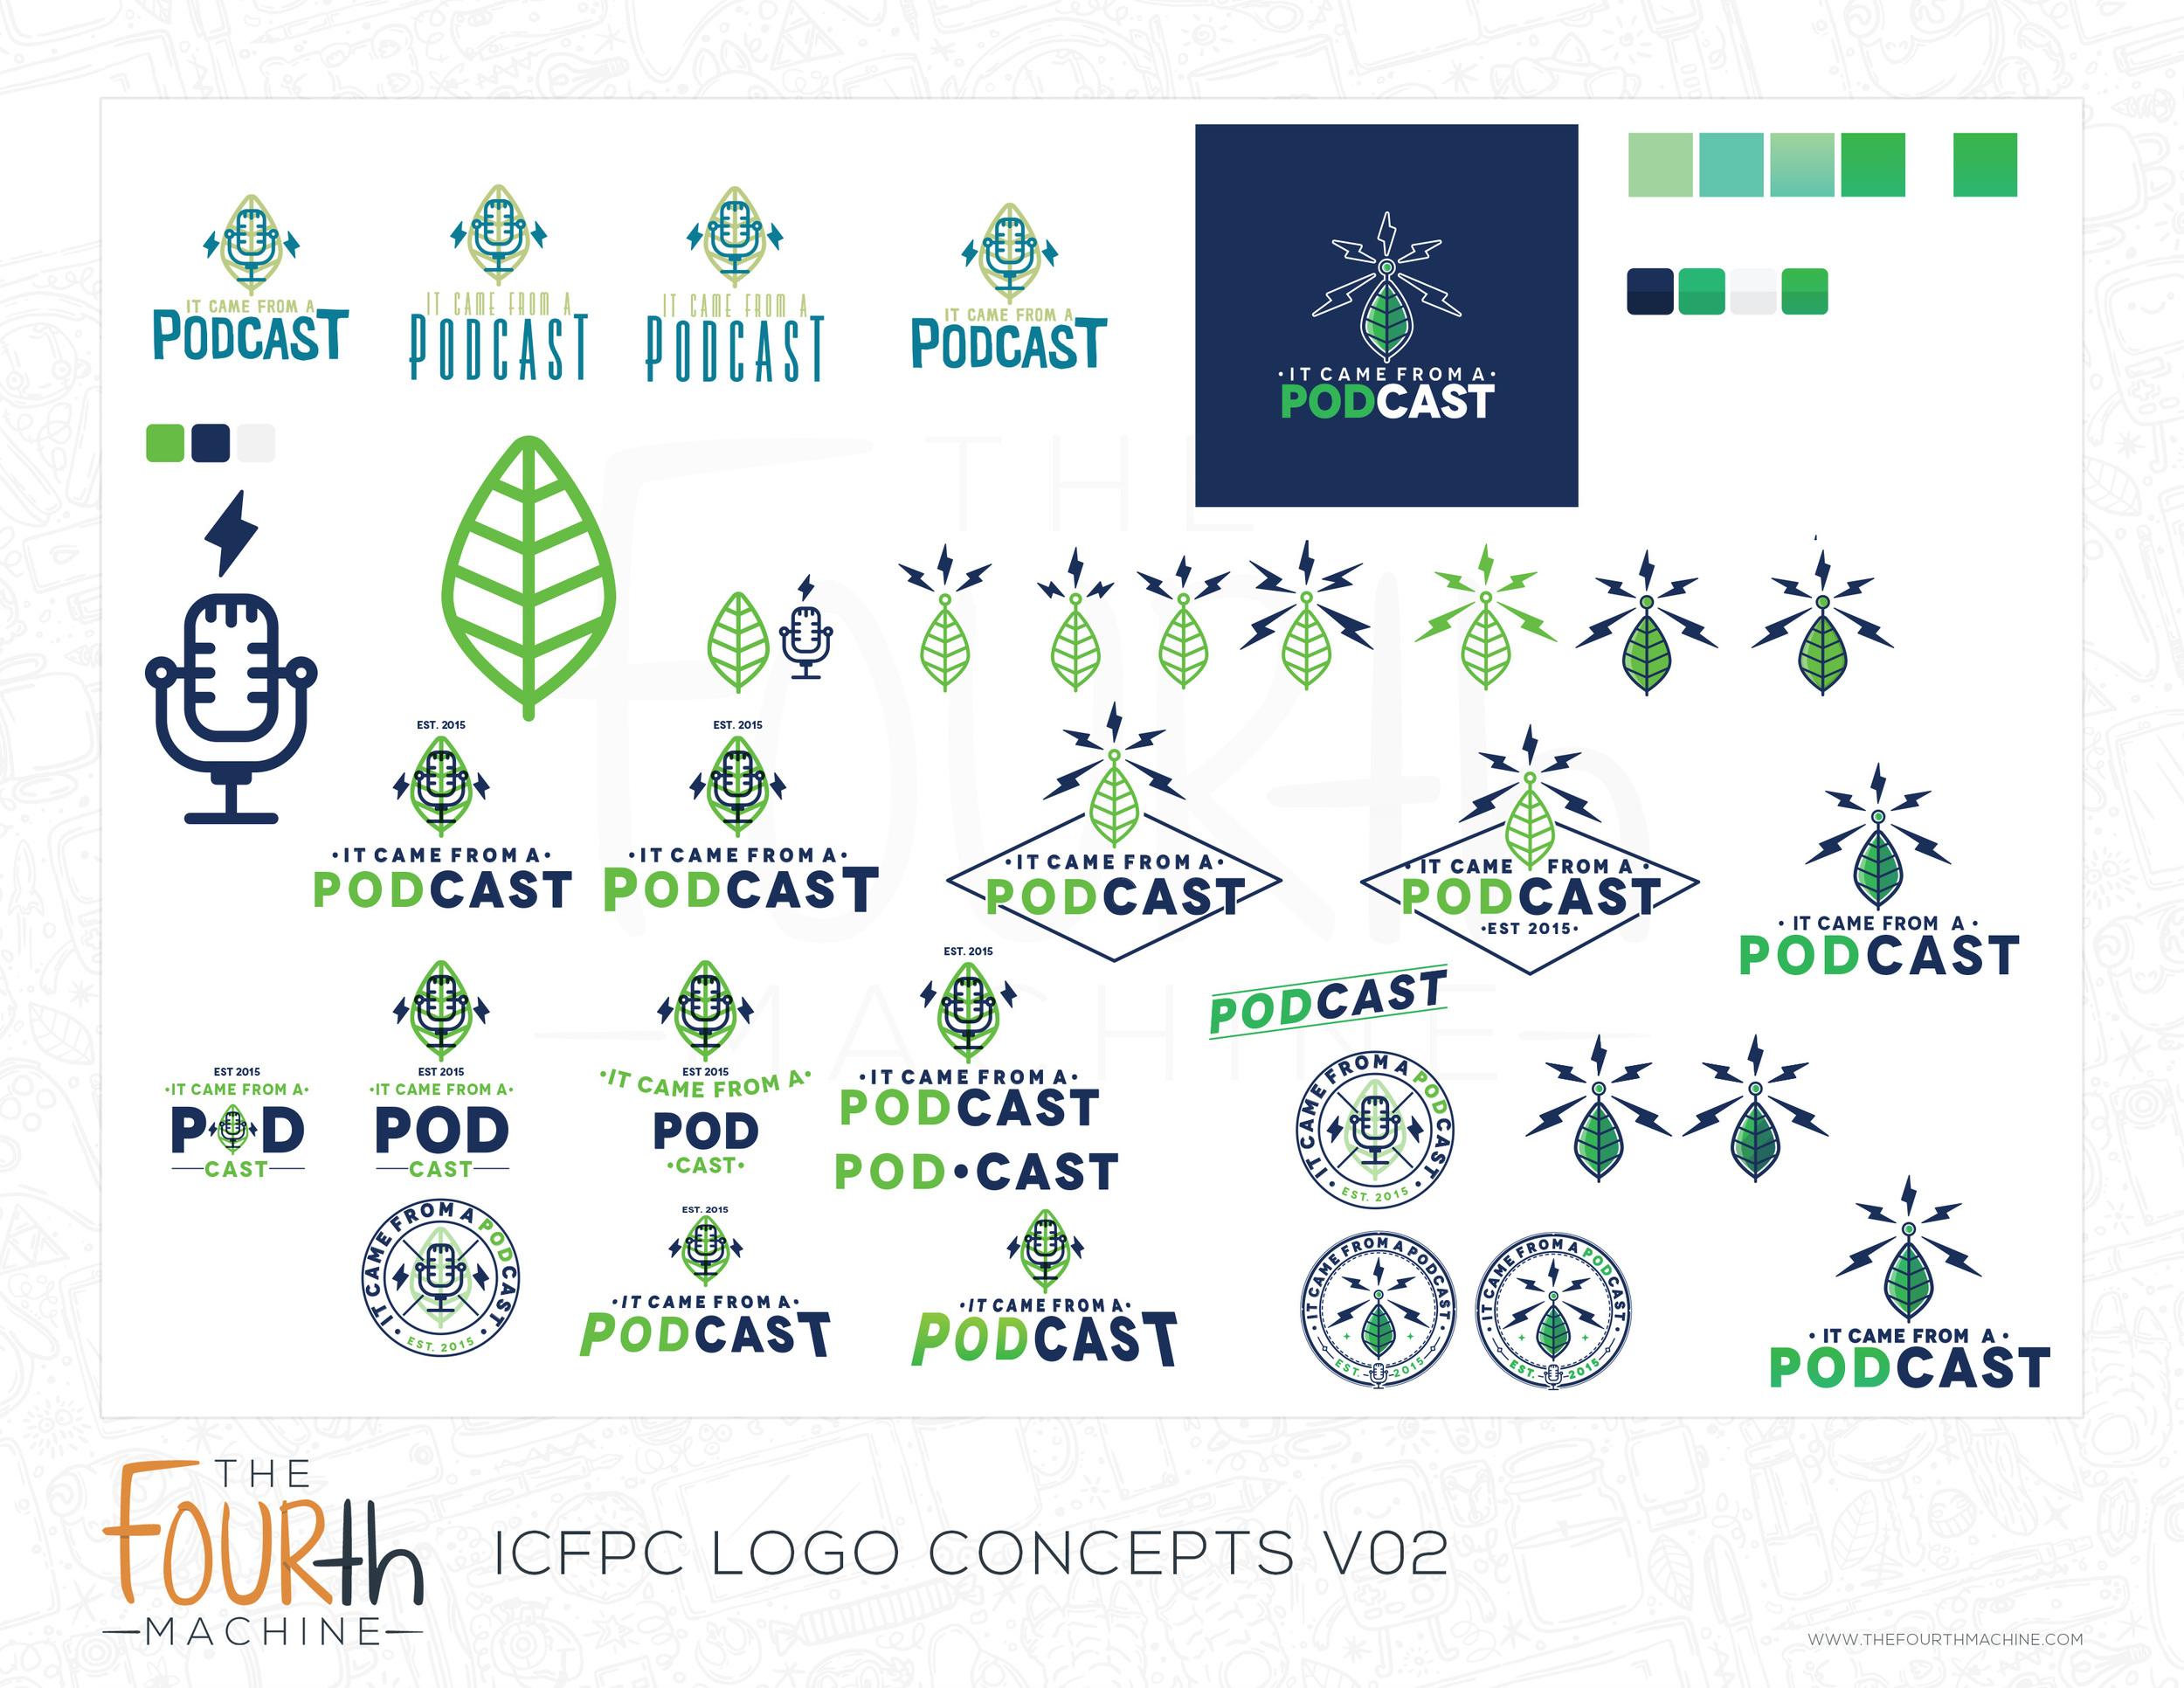 ICFPC_Logo_Concepts_v02.jpg